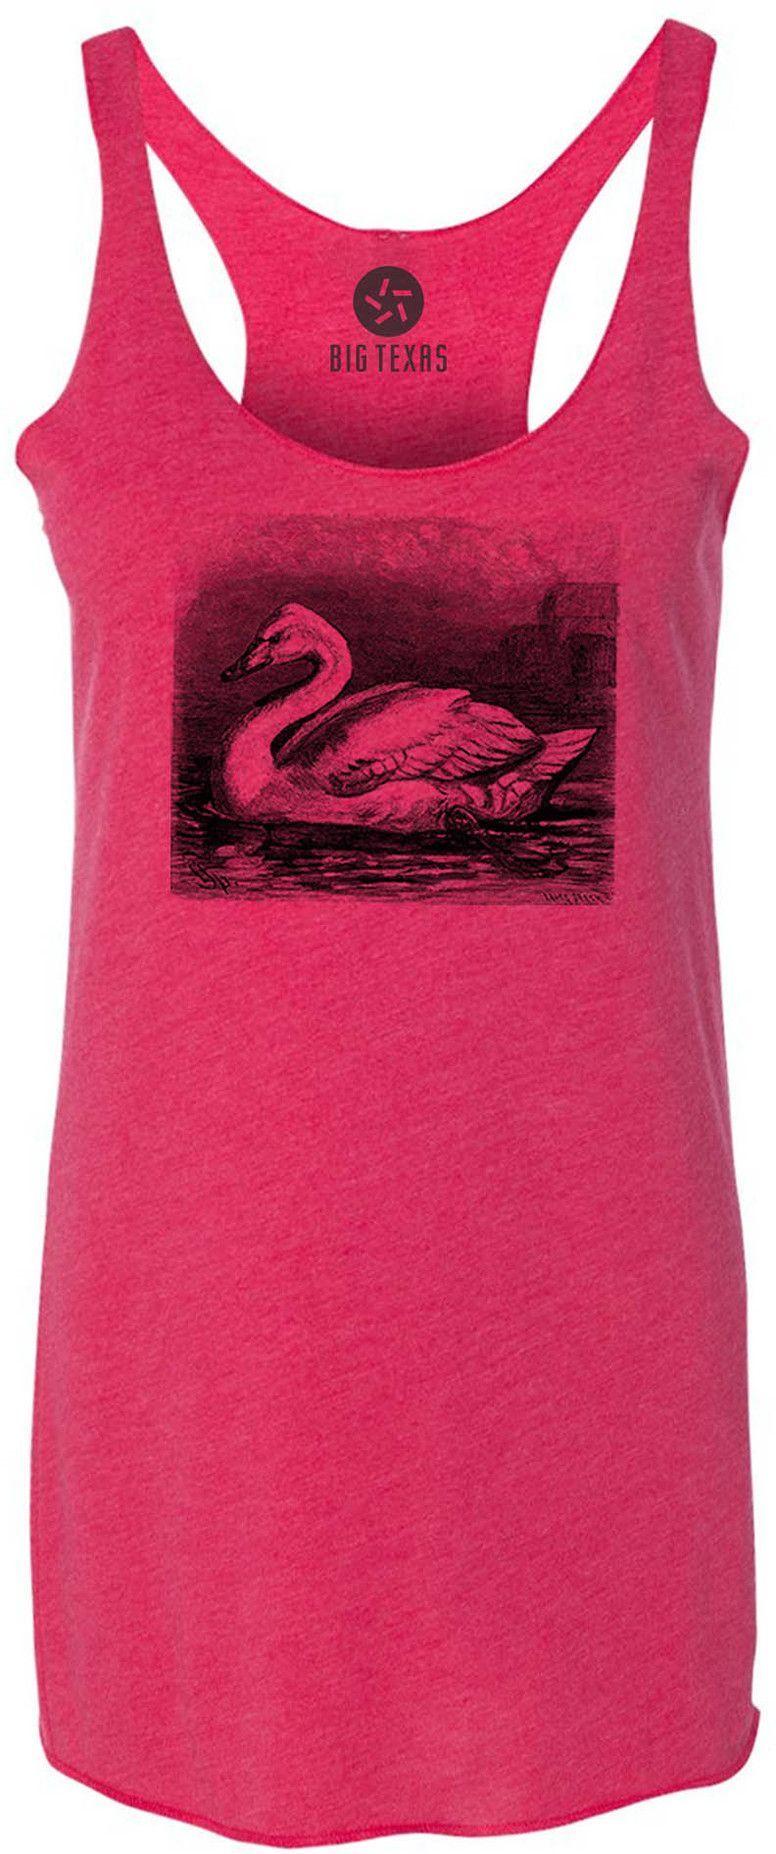 Majestic Swan (Black) Tri-Blend Racerback Tank-Top